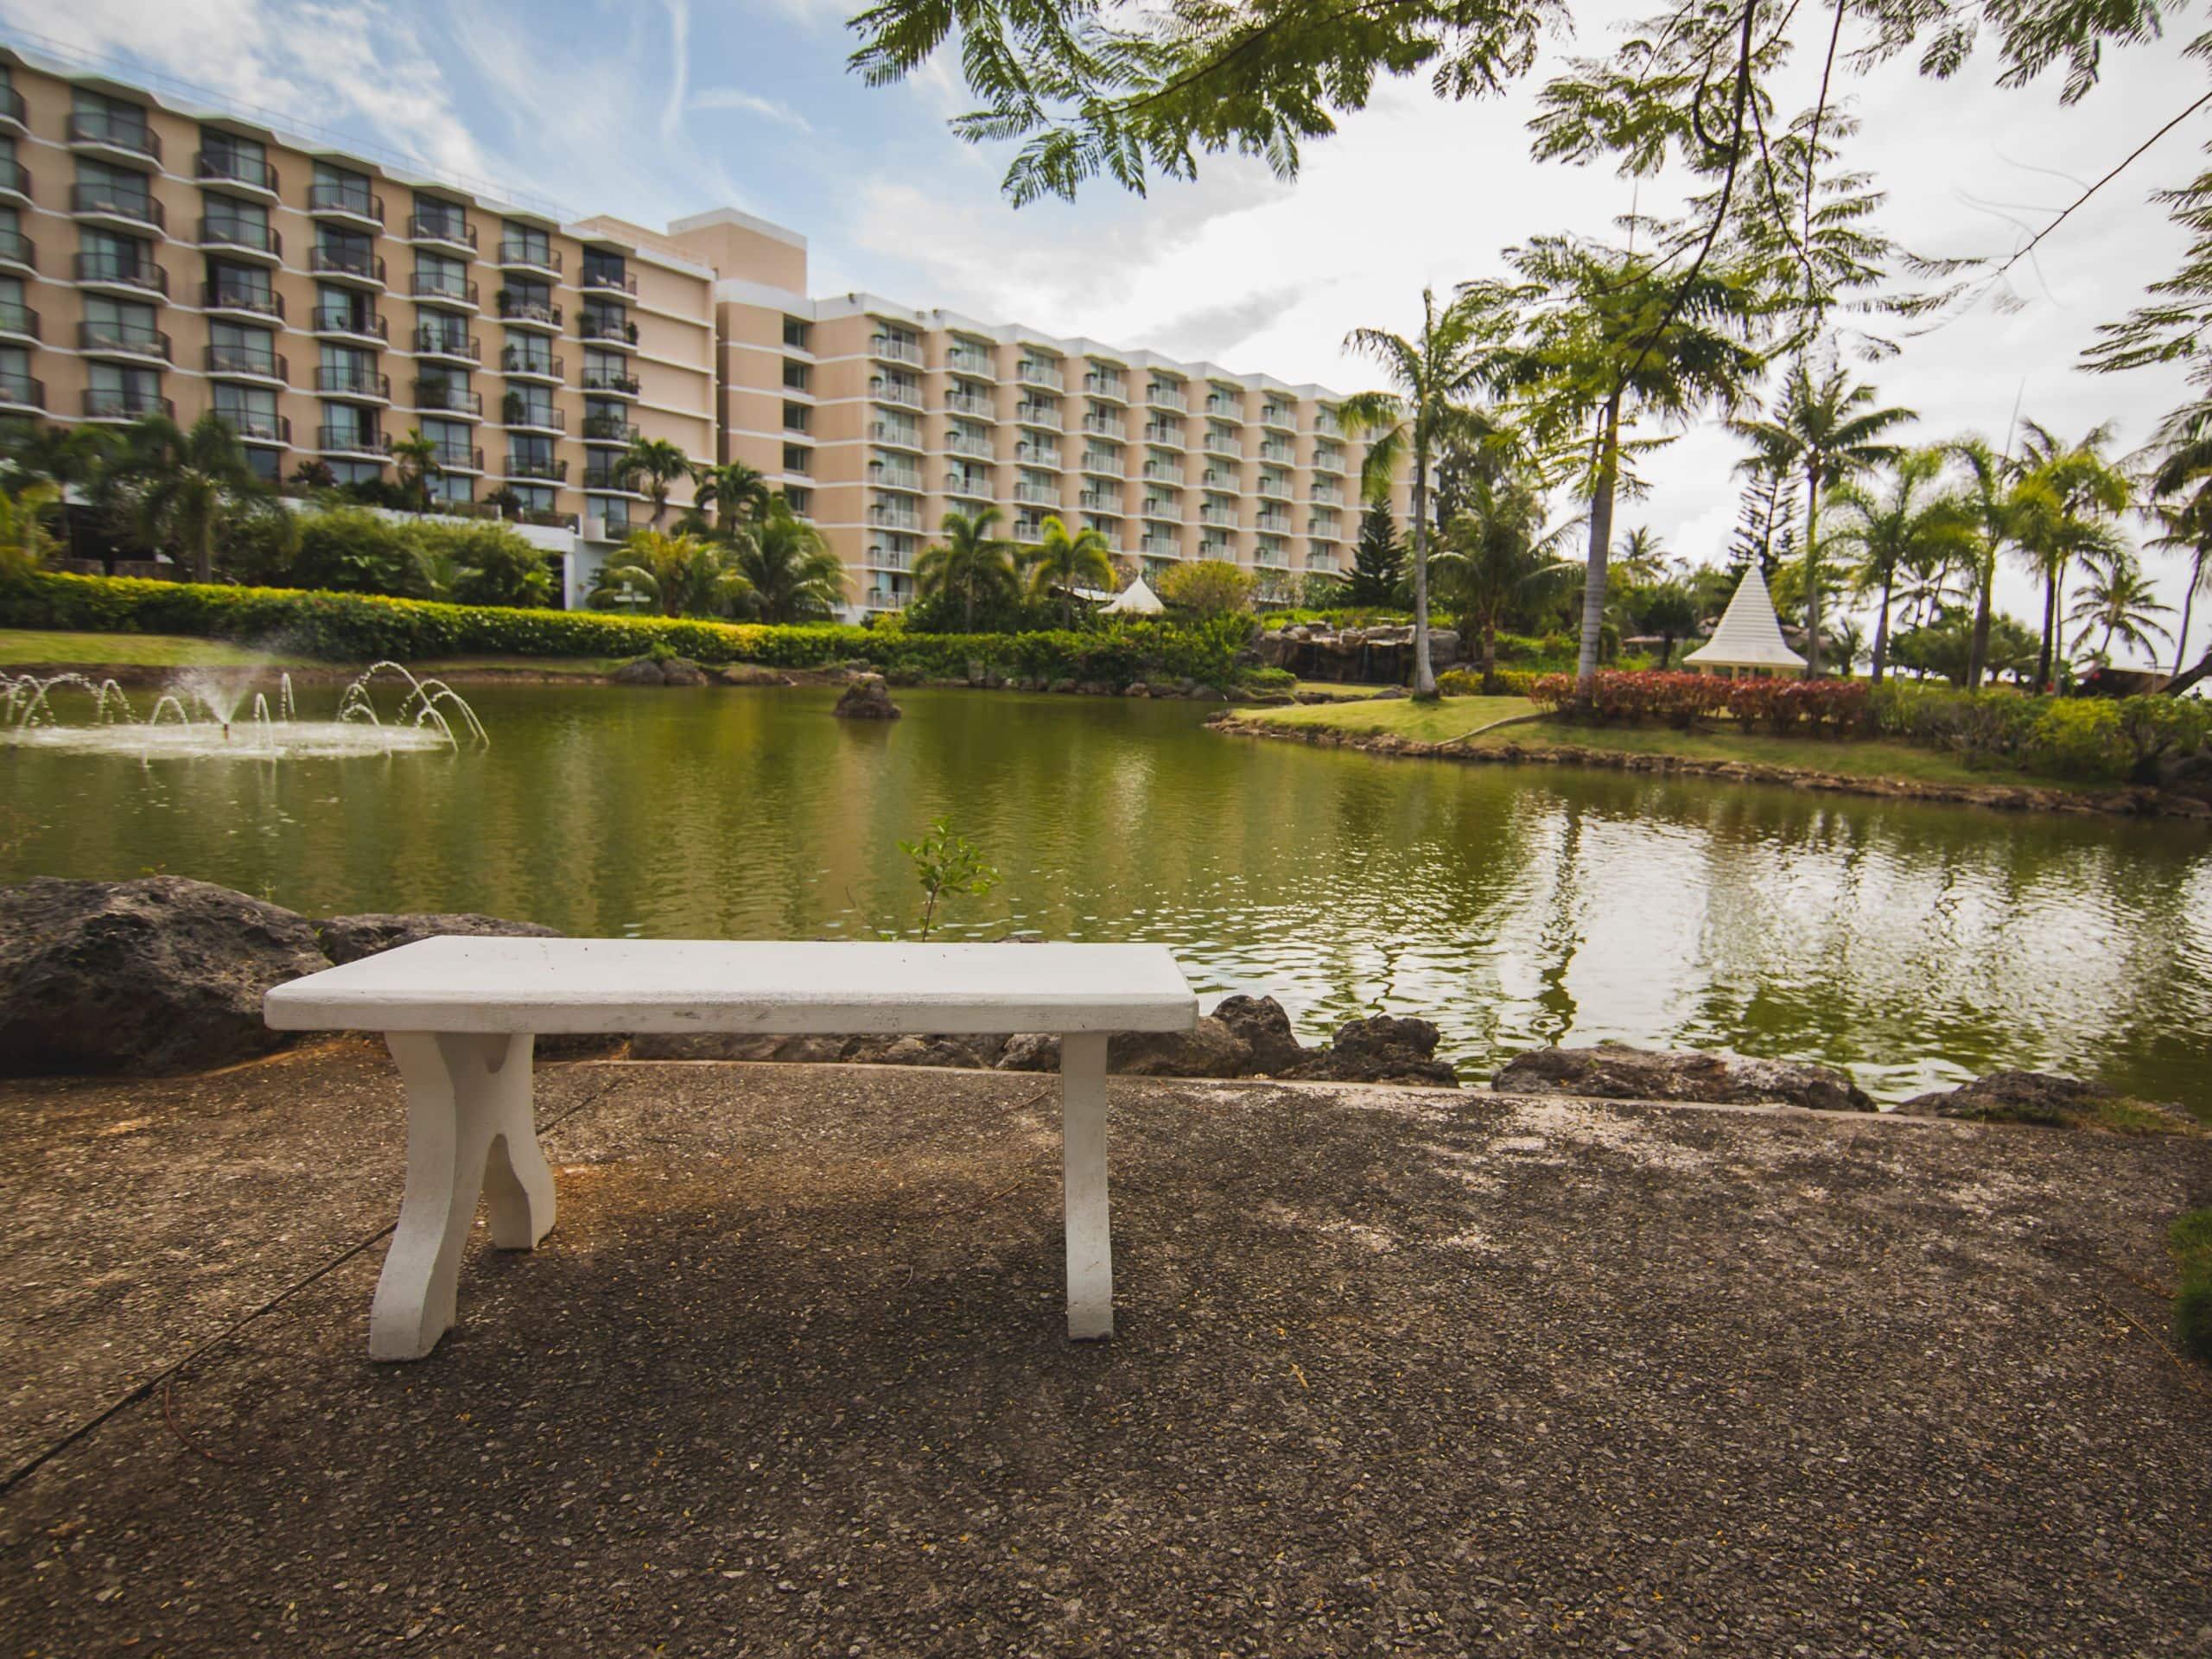 5 Star Luxury Hotel in Saipan Island :: Hyatt Regency Saipan